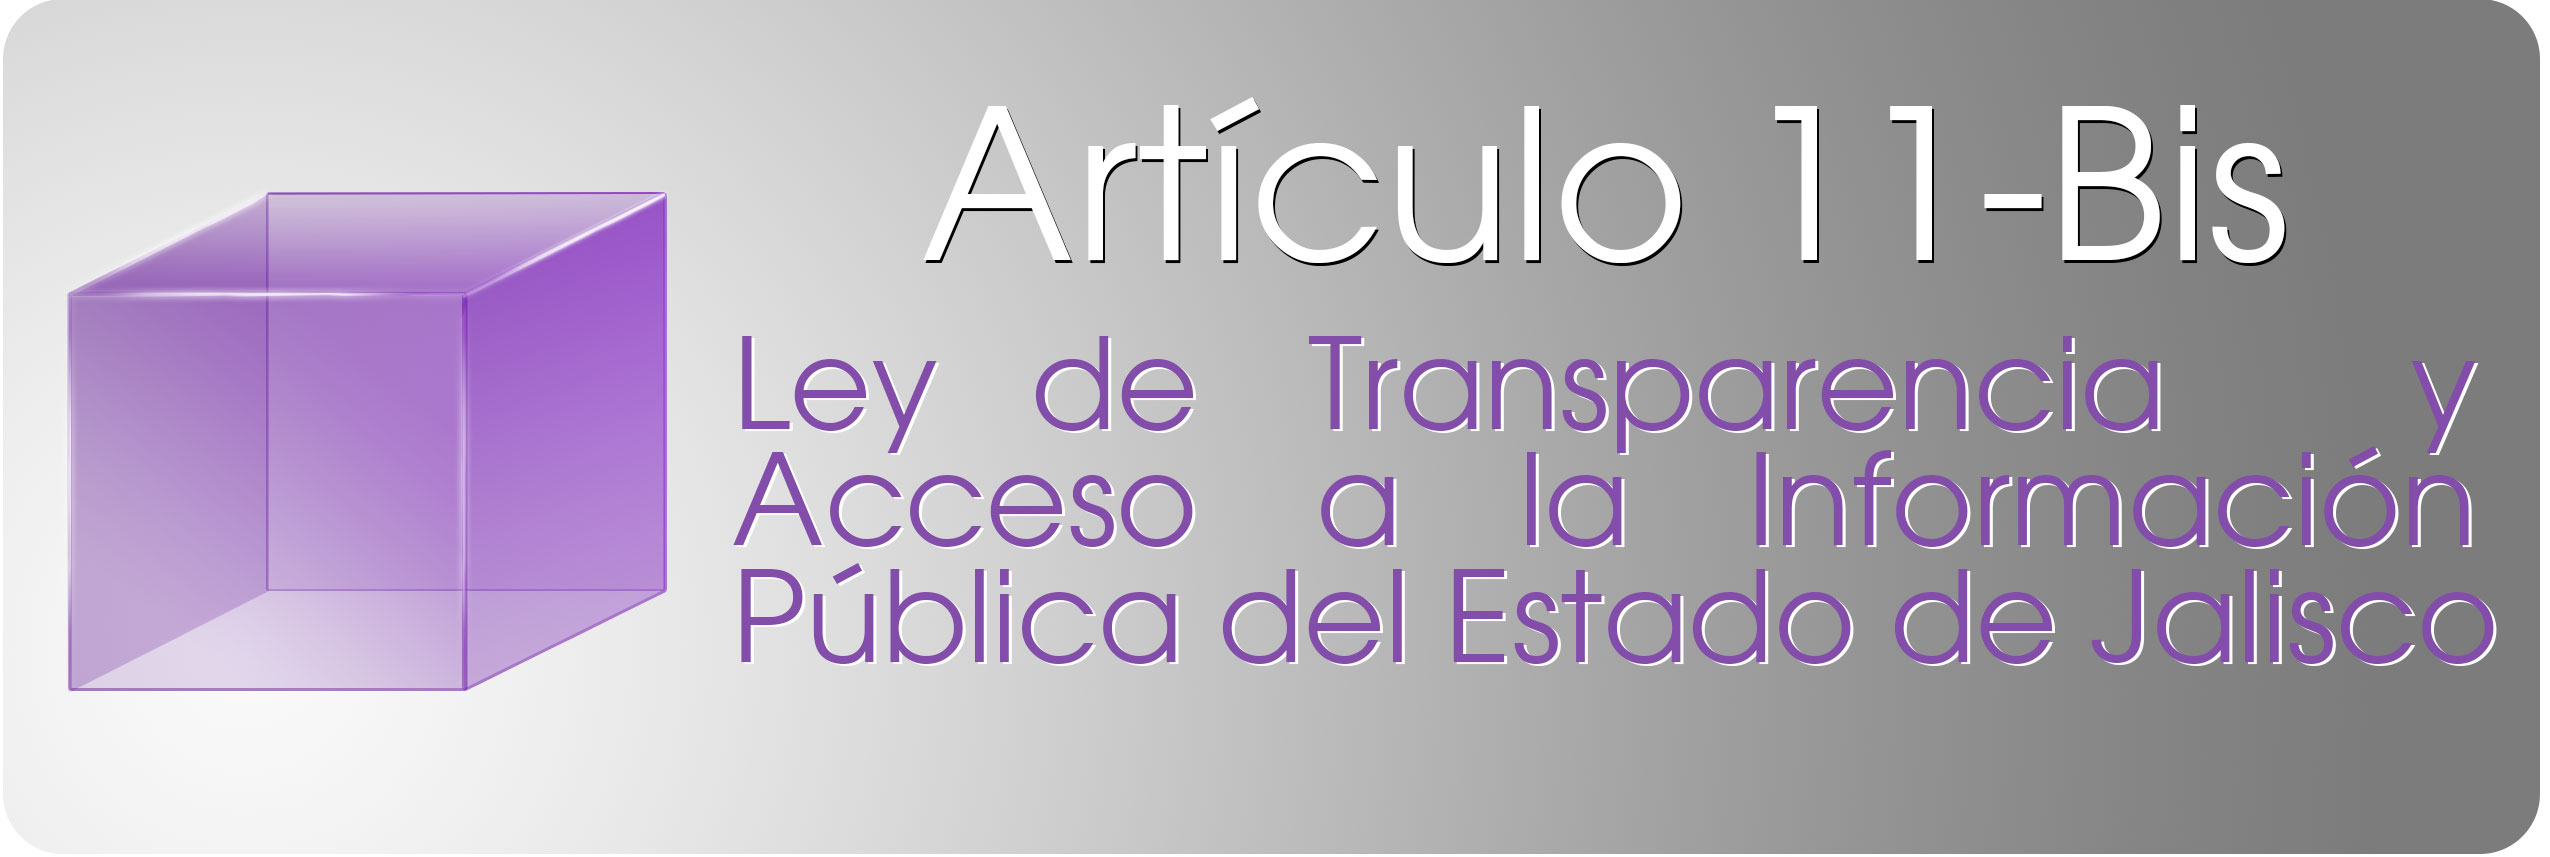 articulo-11-transparencia